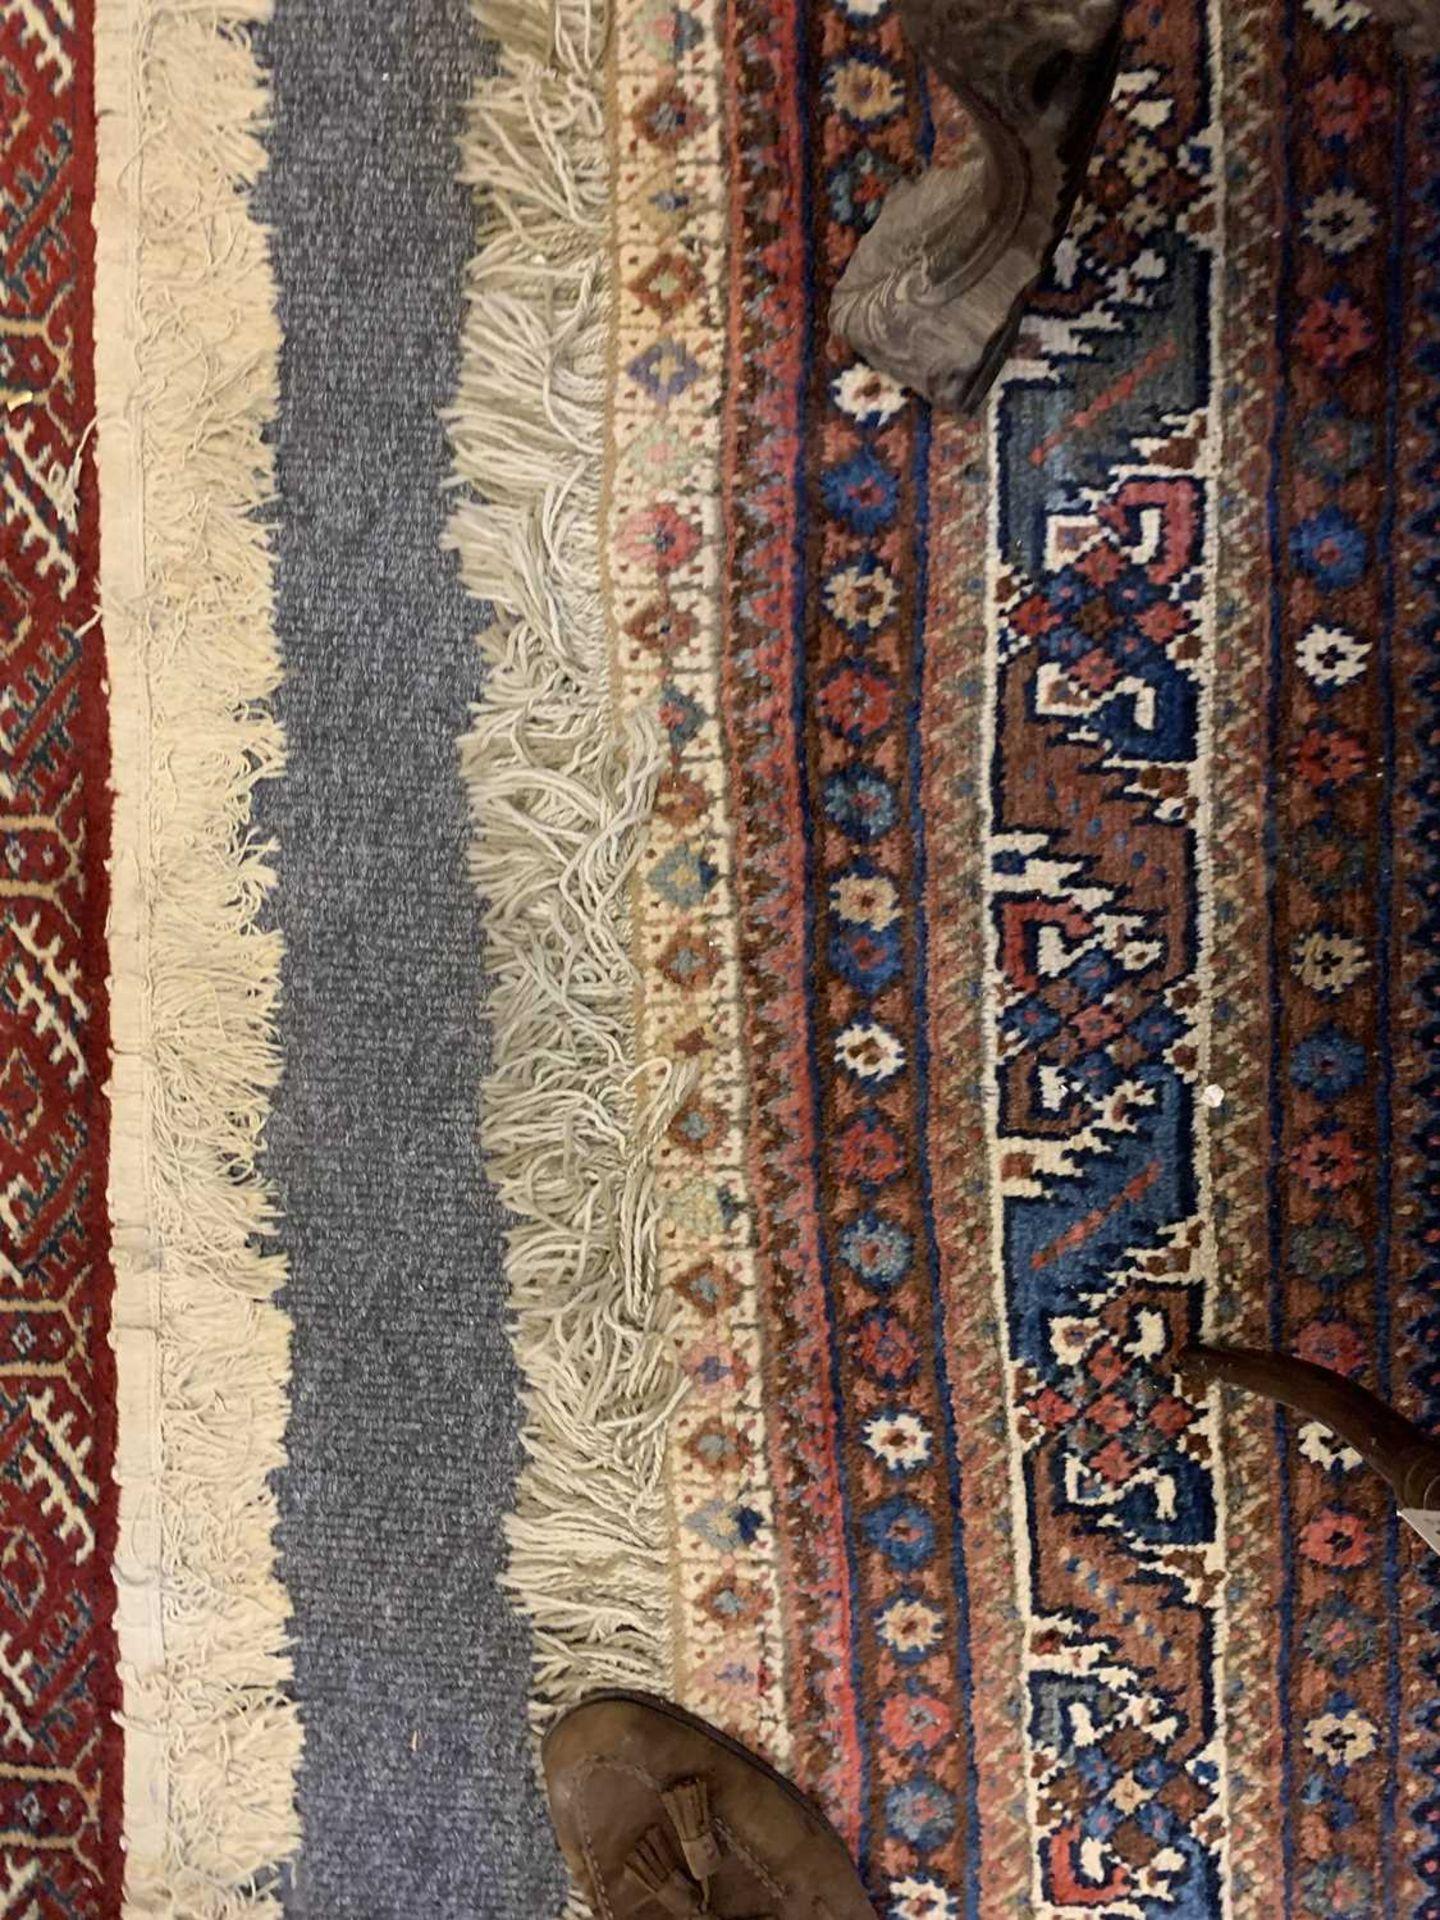 A South West Persian Khamseh carpet, - Image 8 of 17